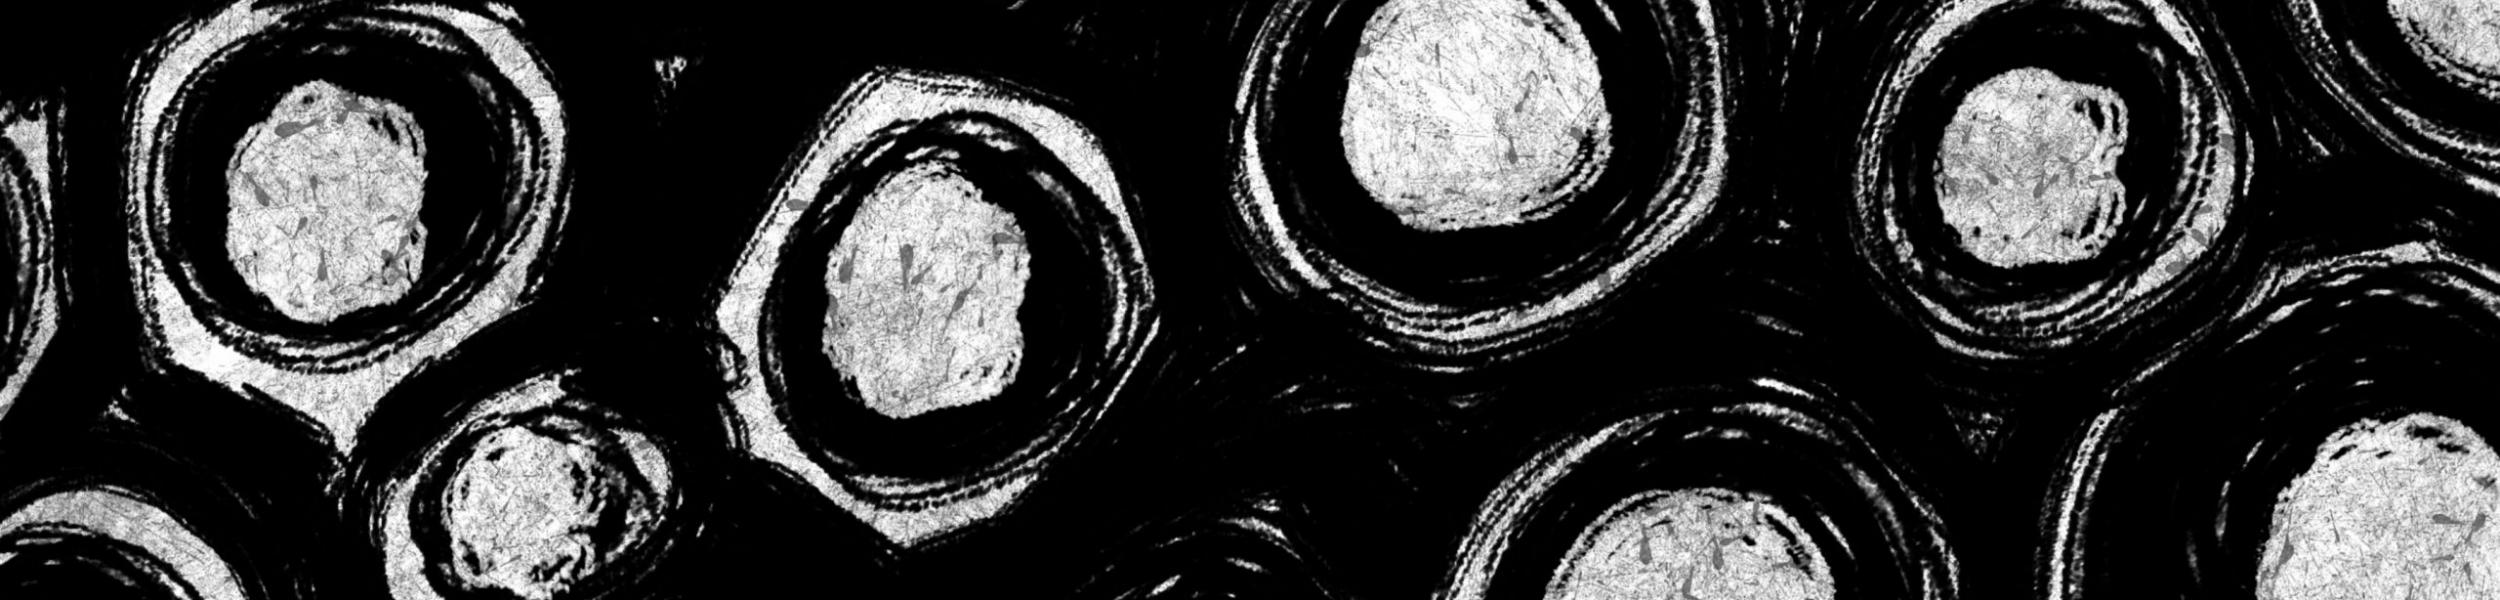 CSTEP_Black-White-Digital-Paper-Textured_9